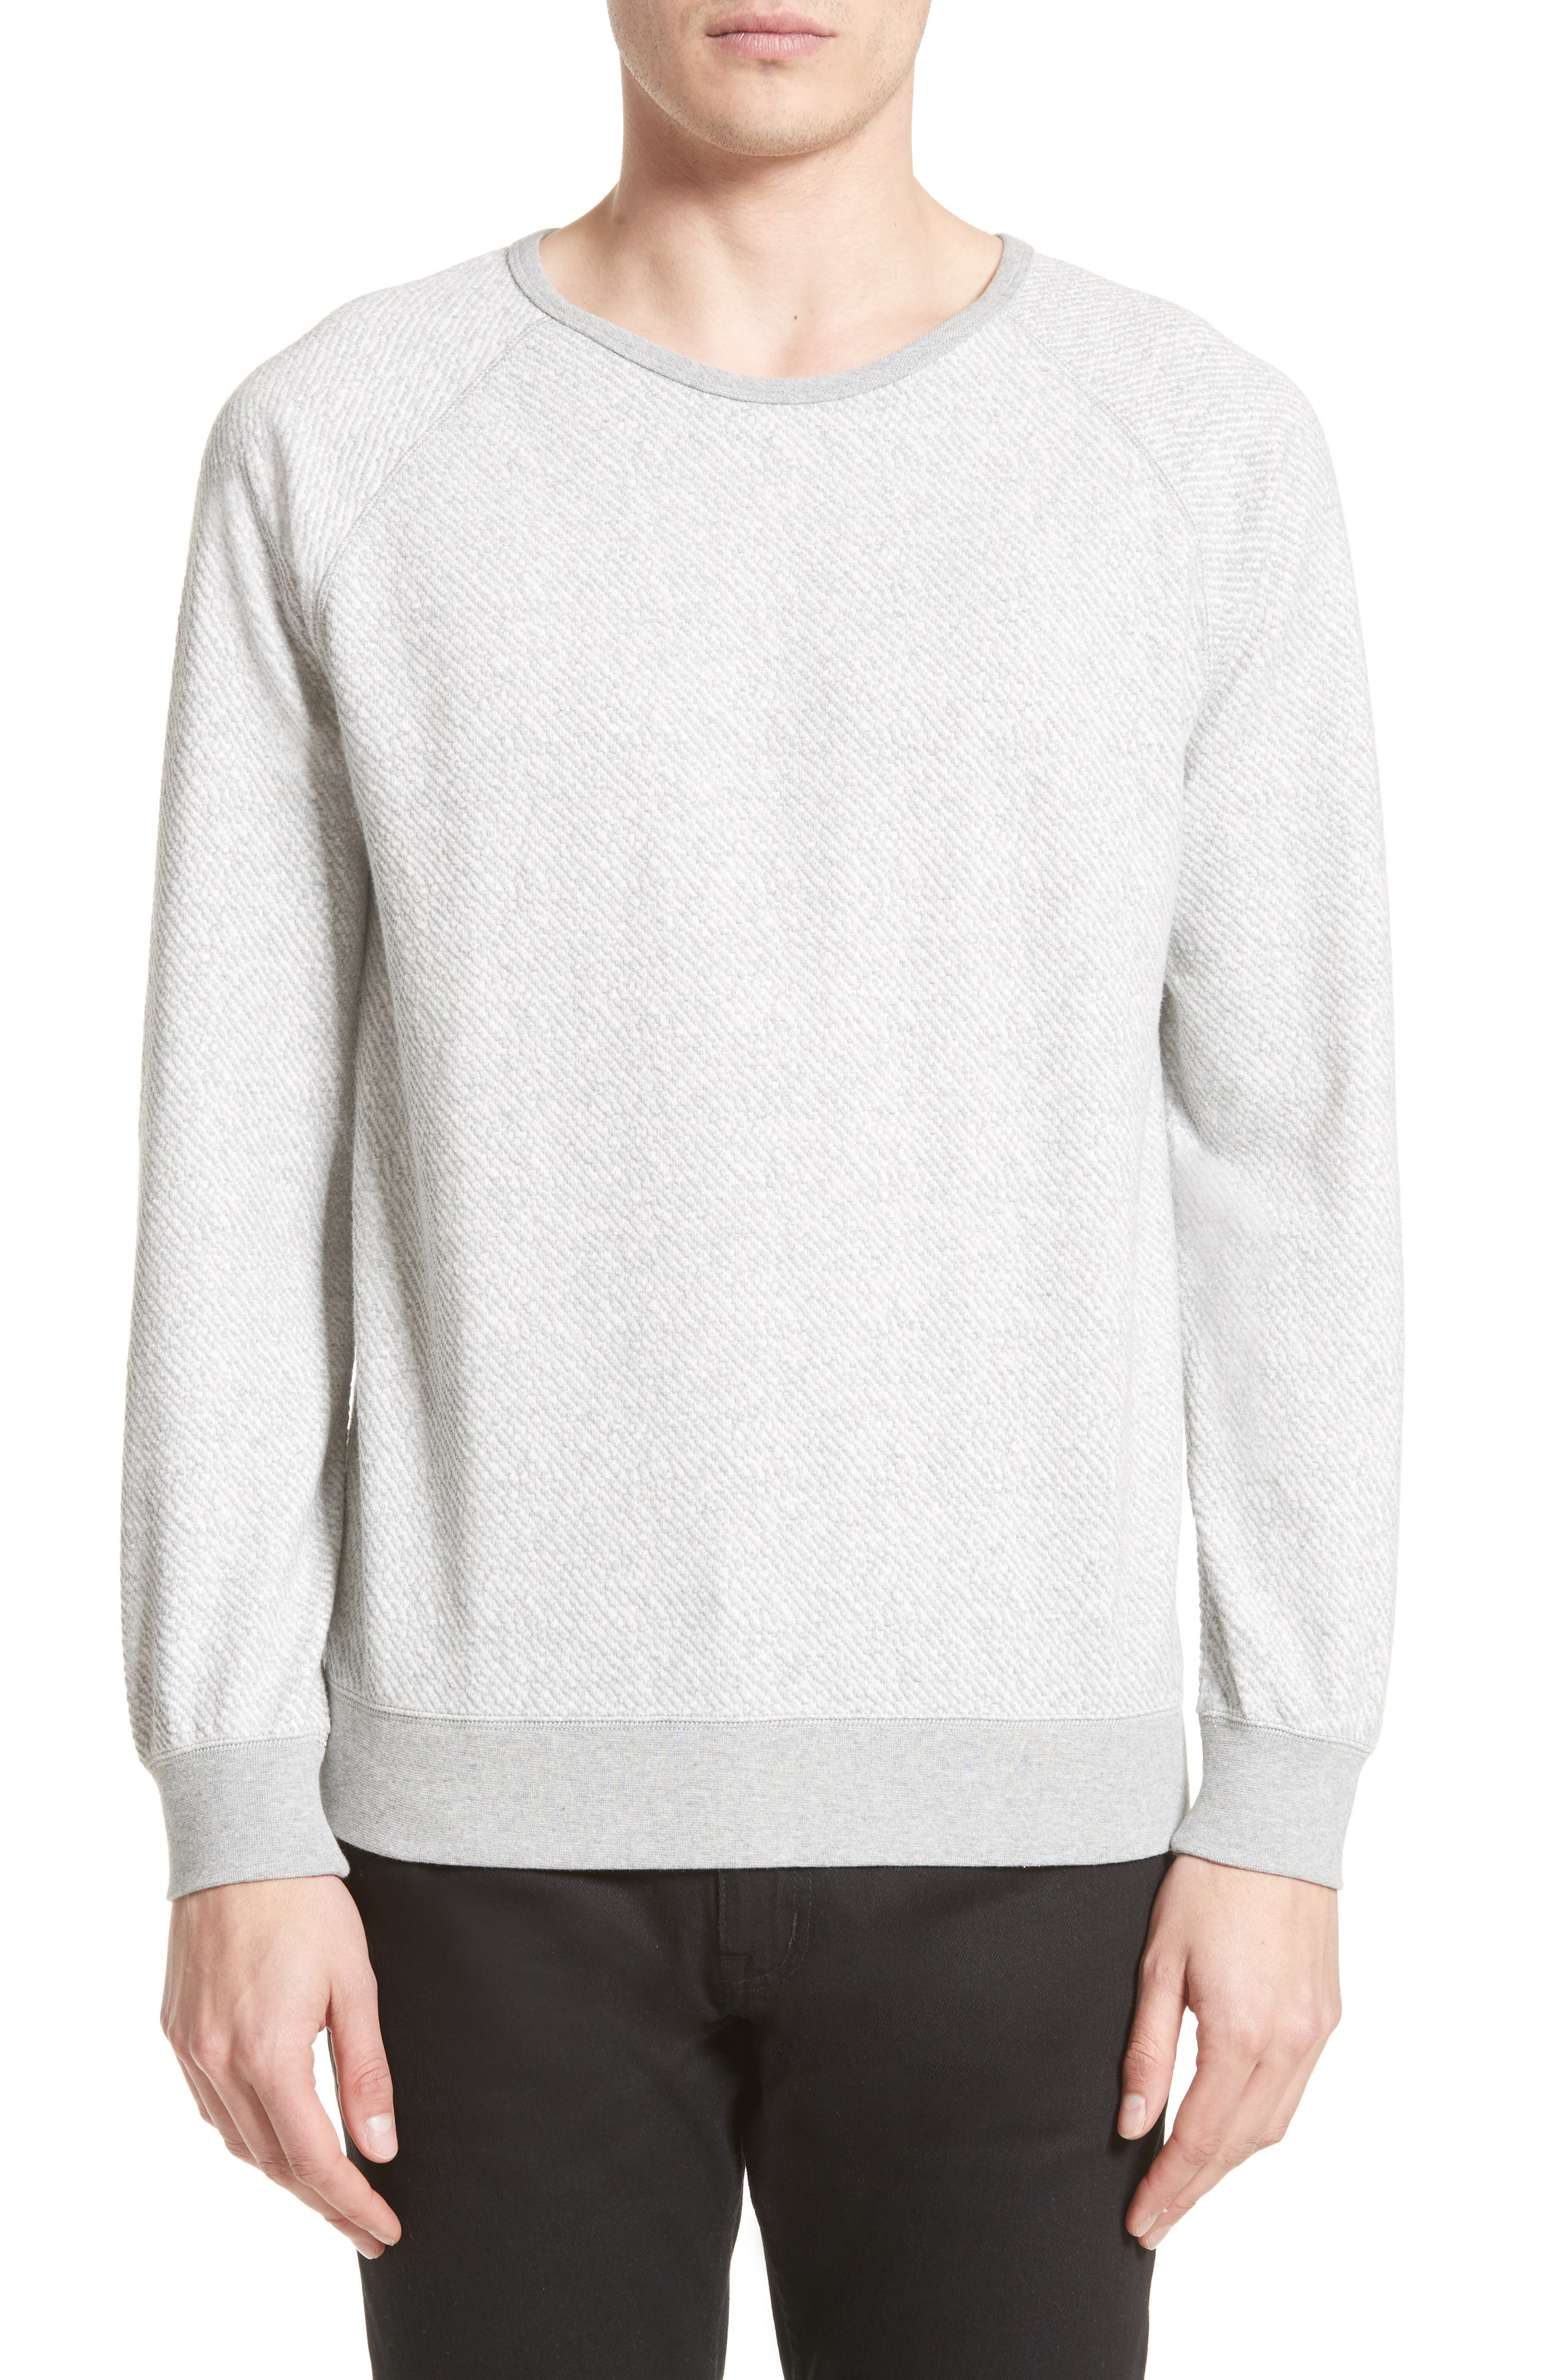 Kasu Sweater,                             Main thumbnail 1, color,                             035